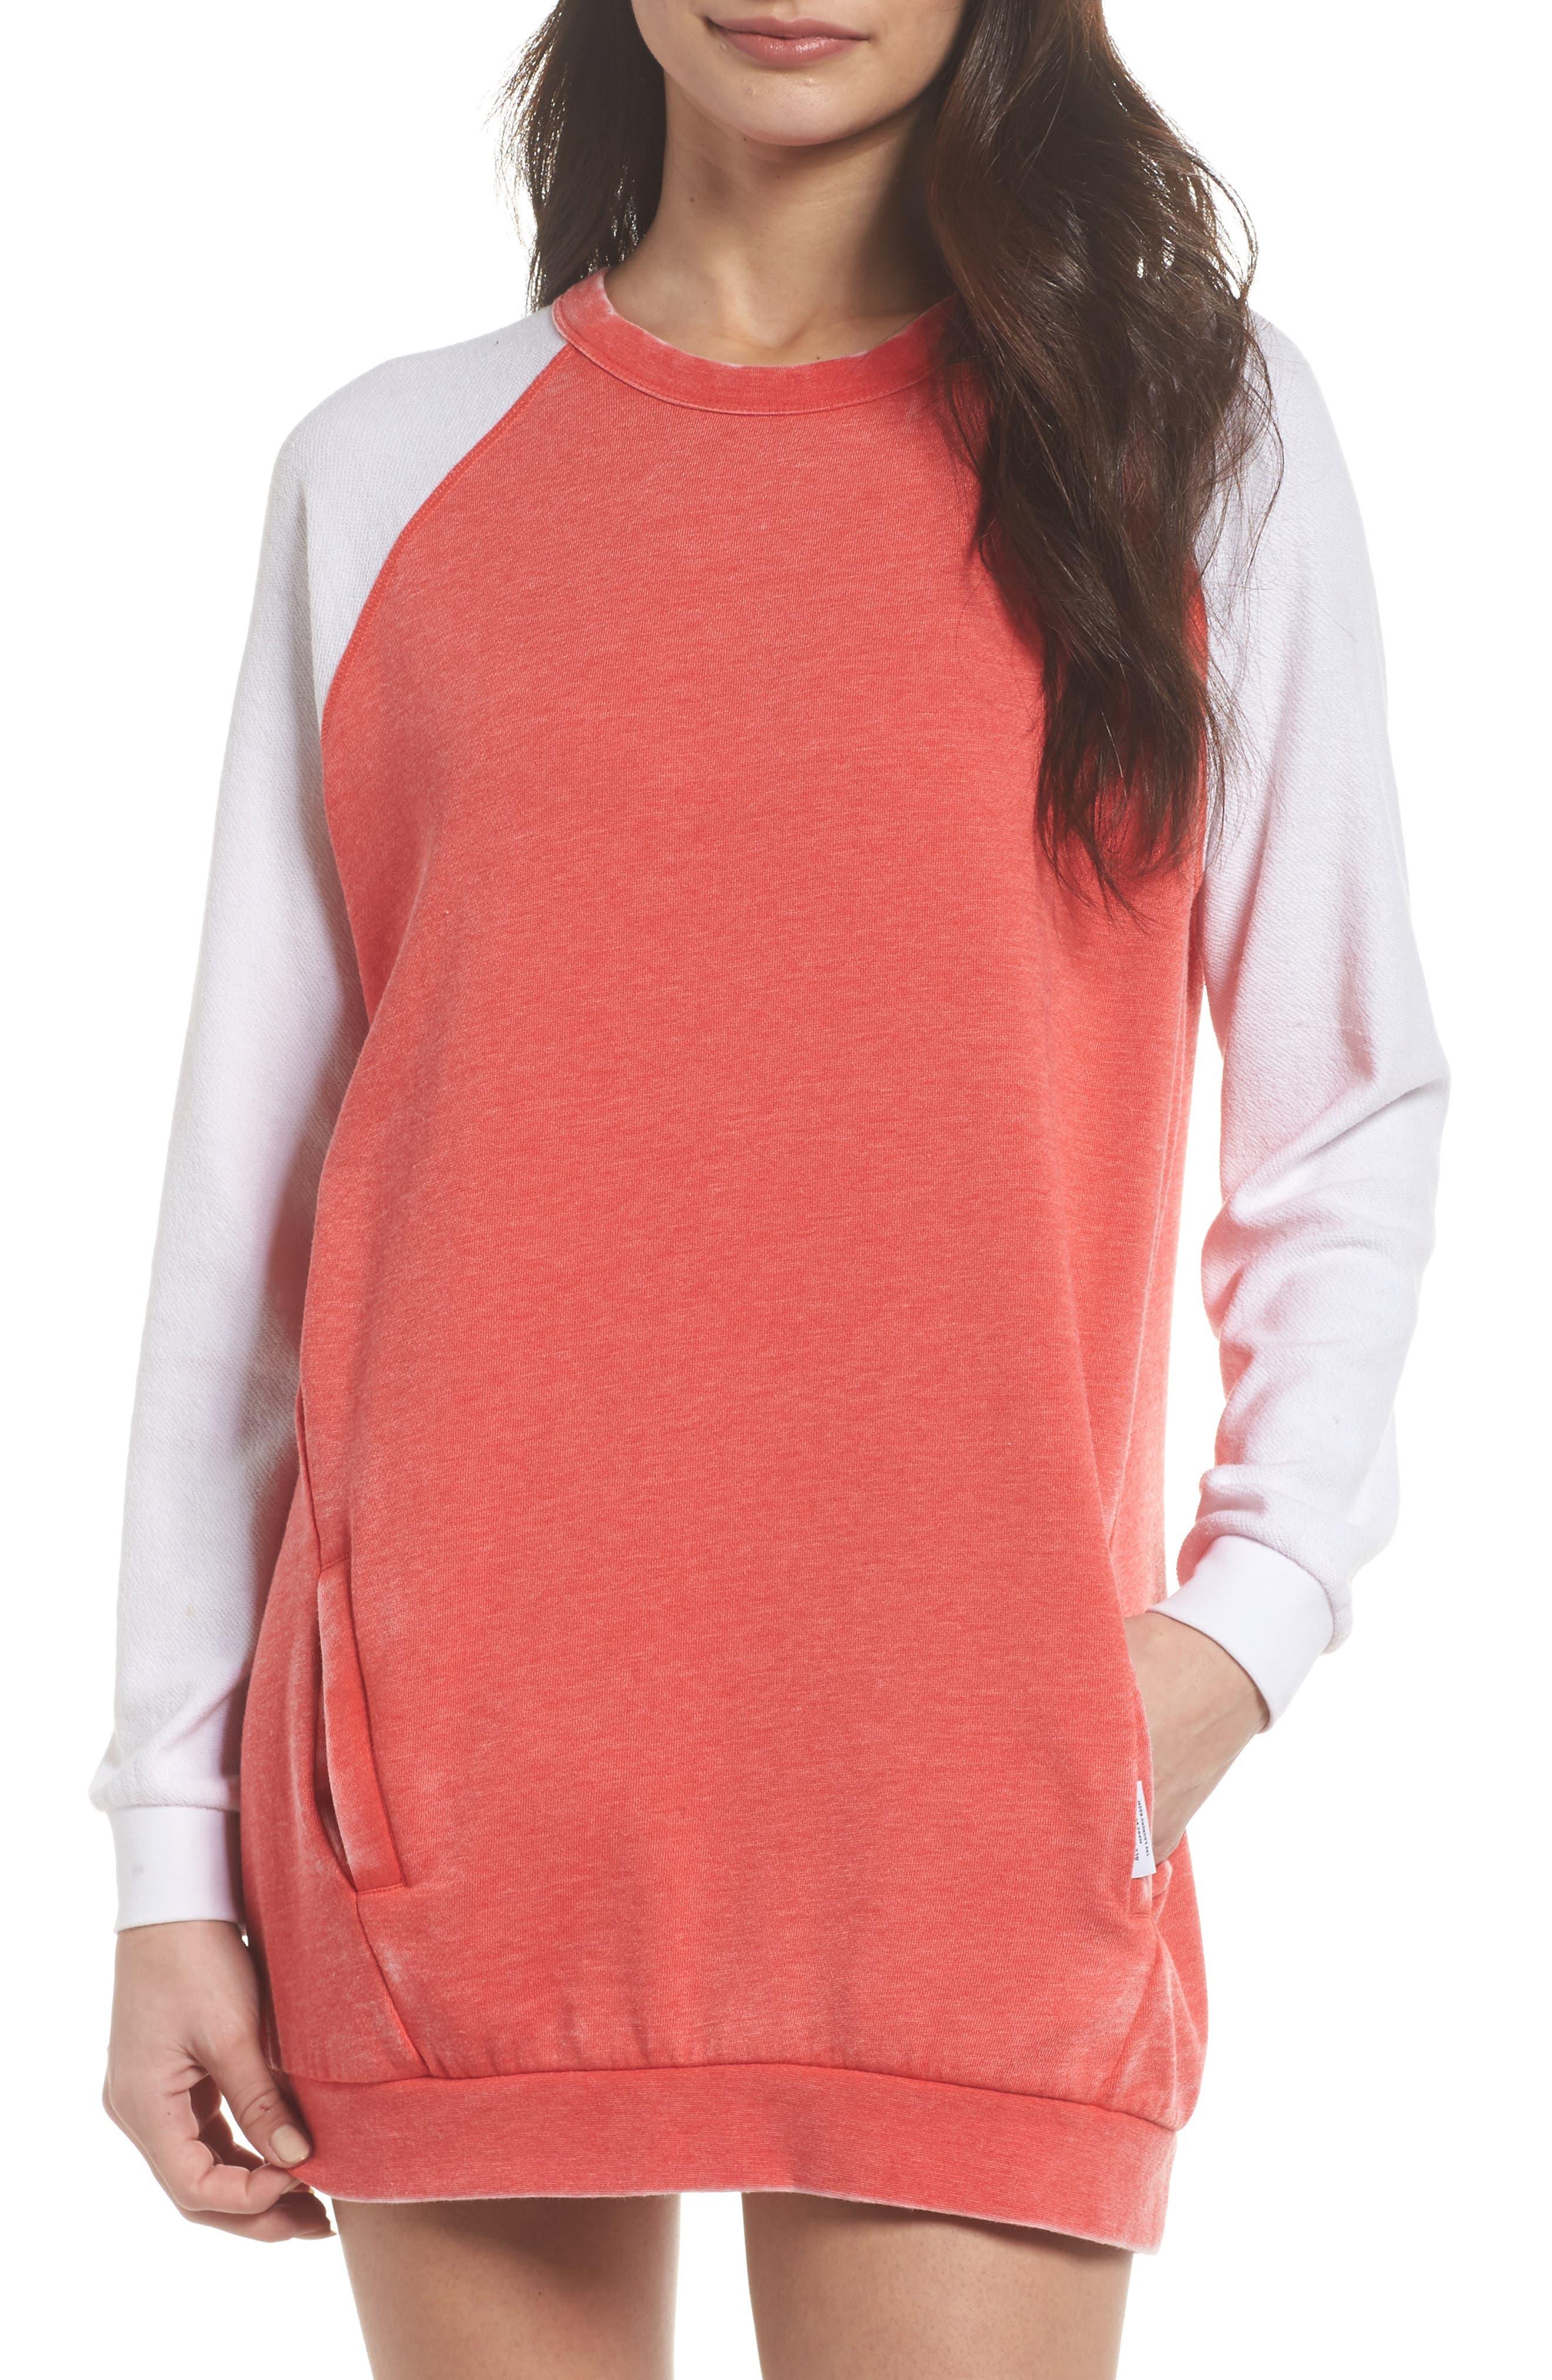 Lounge Sweatshirt Dress,                         Main,                         color, Love Red/ White